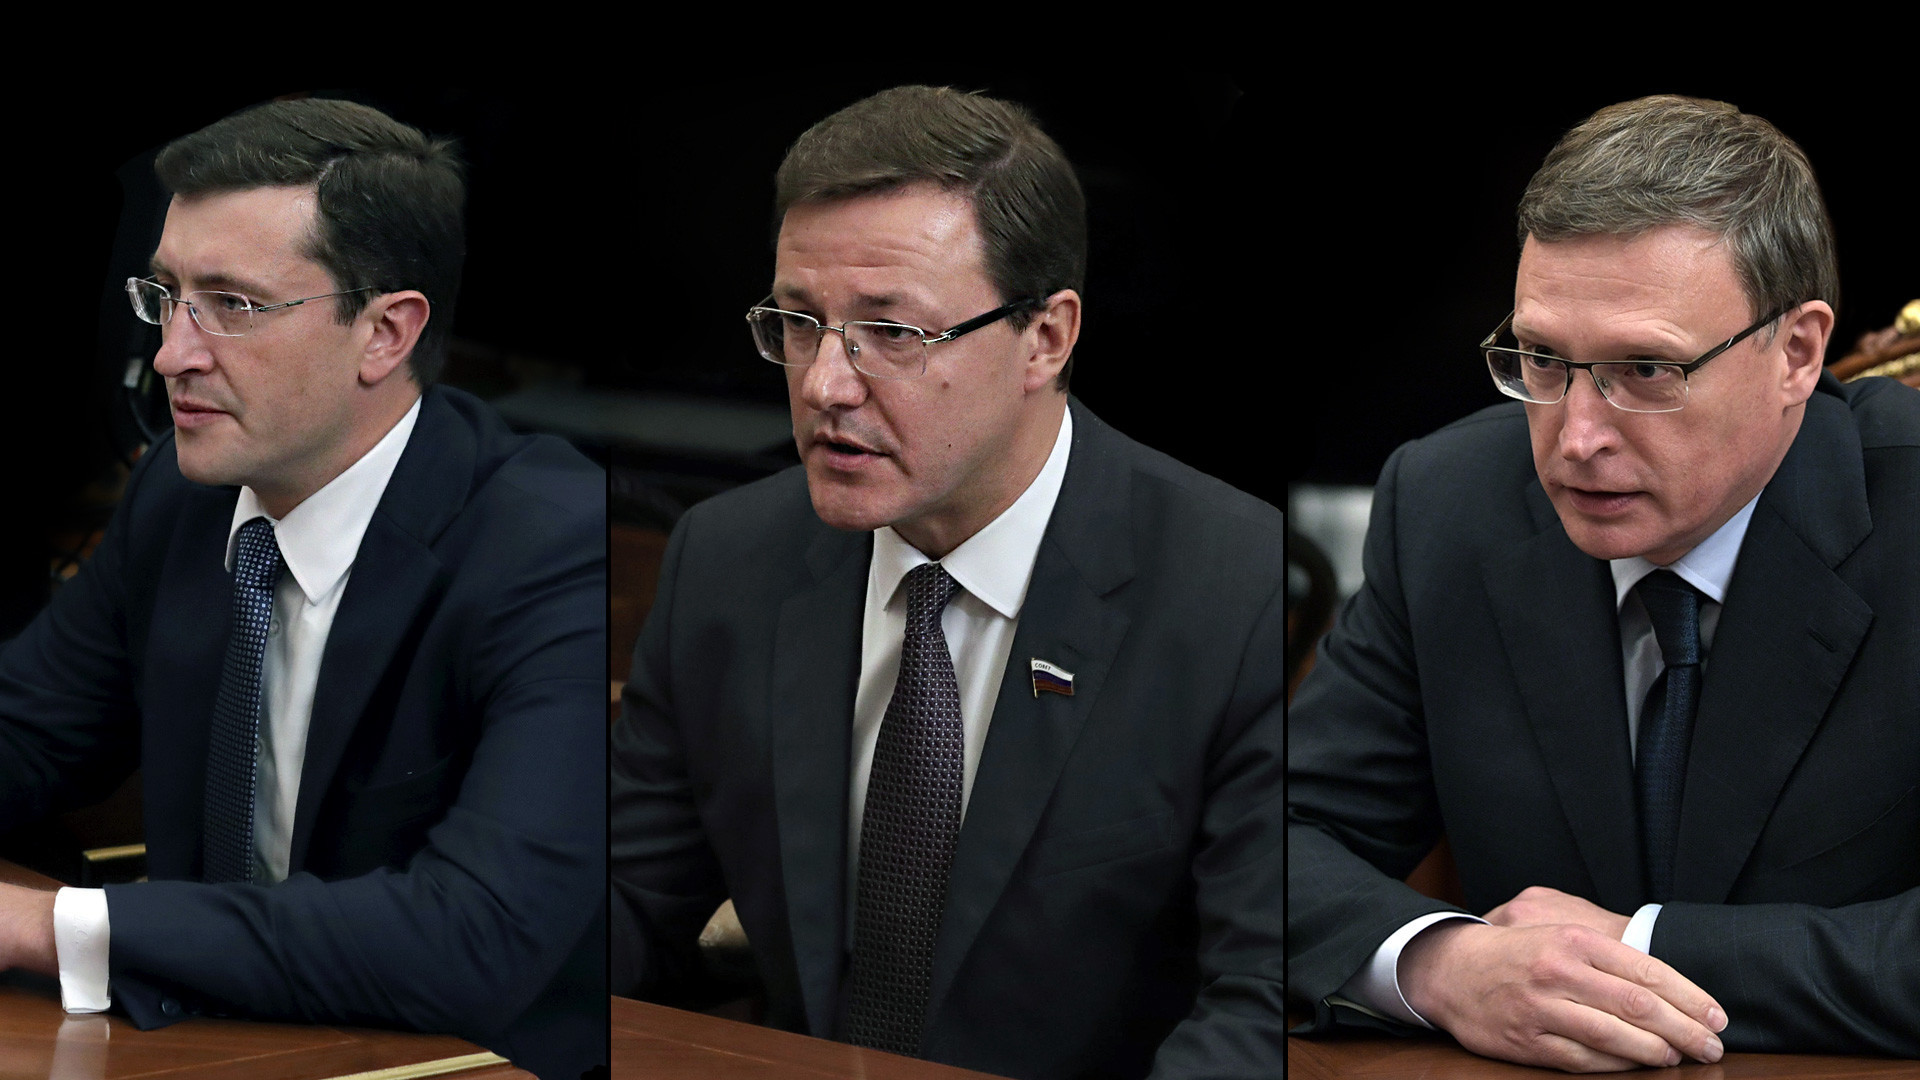 Gleb Nikitin, Dmitry Azarov, Alexander Burkov (dari kiri ke kanan) - tiga gubernur sementara yang ditunjuk Vladimir Putin.